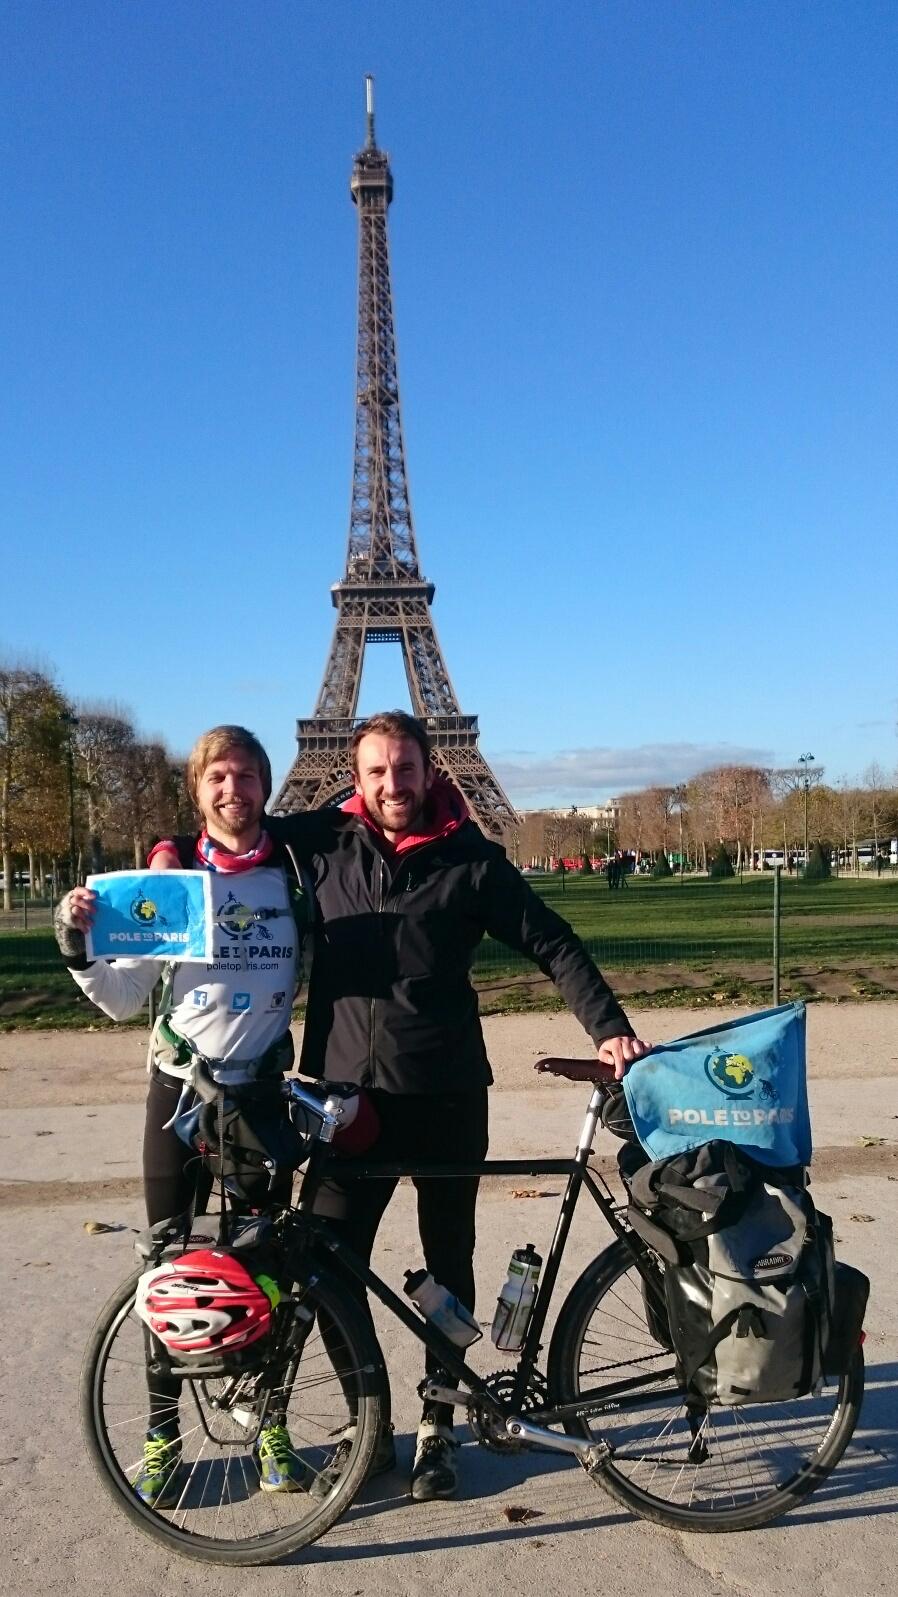 Pole to Paris